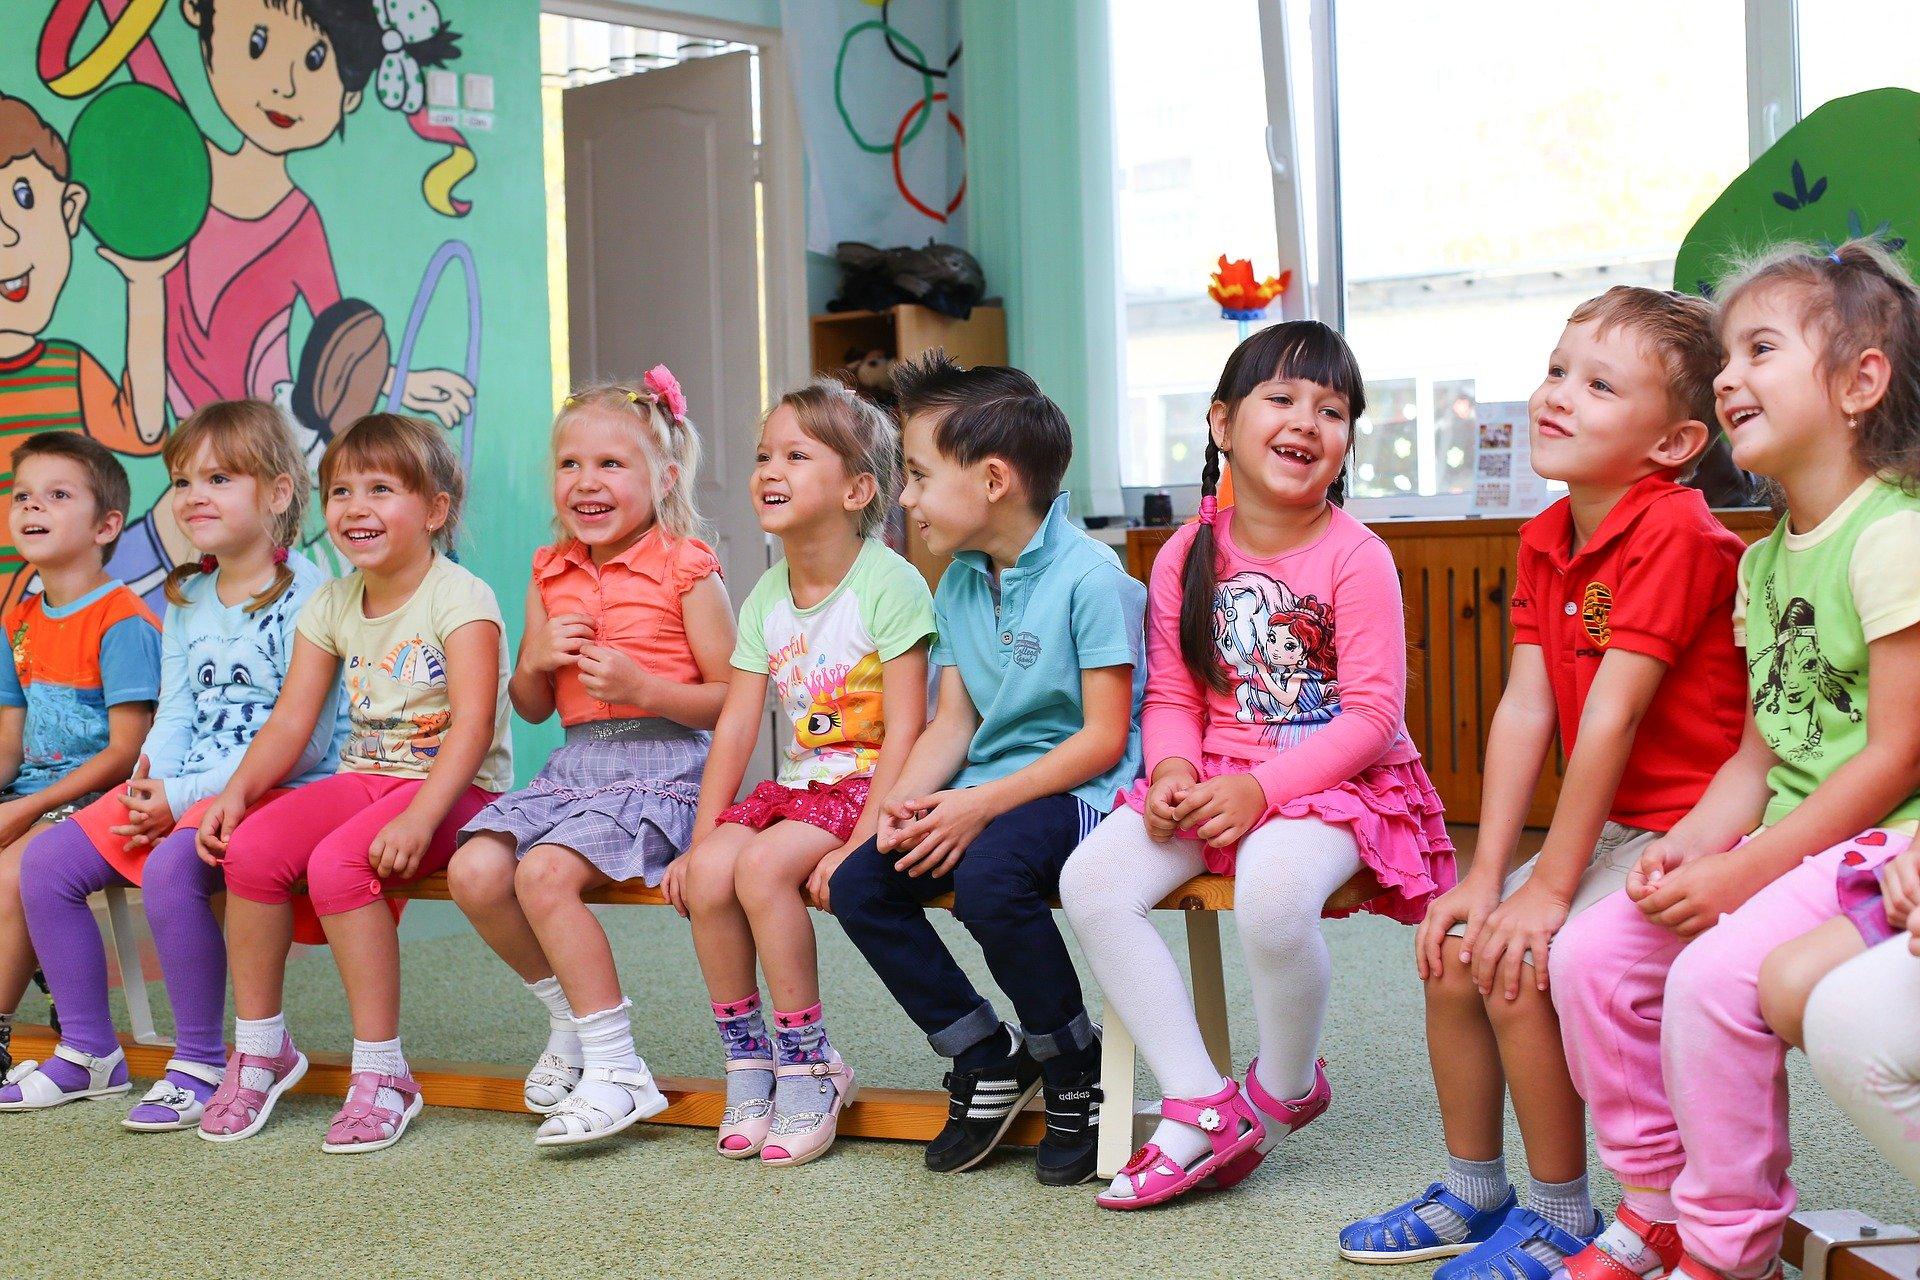 zapis-deti-do-ms-mc-praha-5-na-skolni-rok-2020-2021-a-dny-otevrenych-dveri